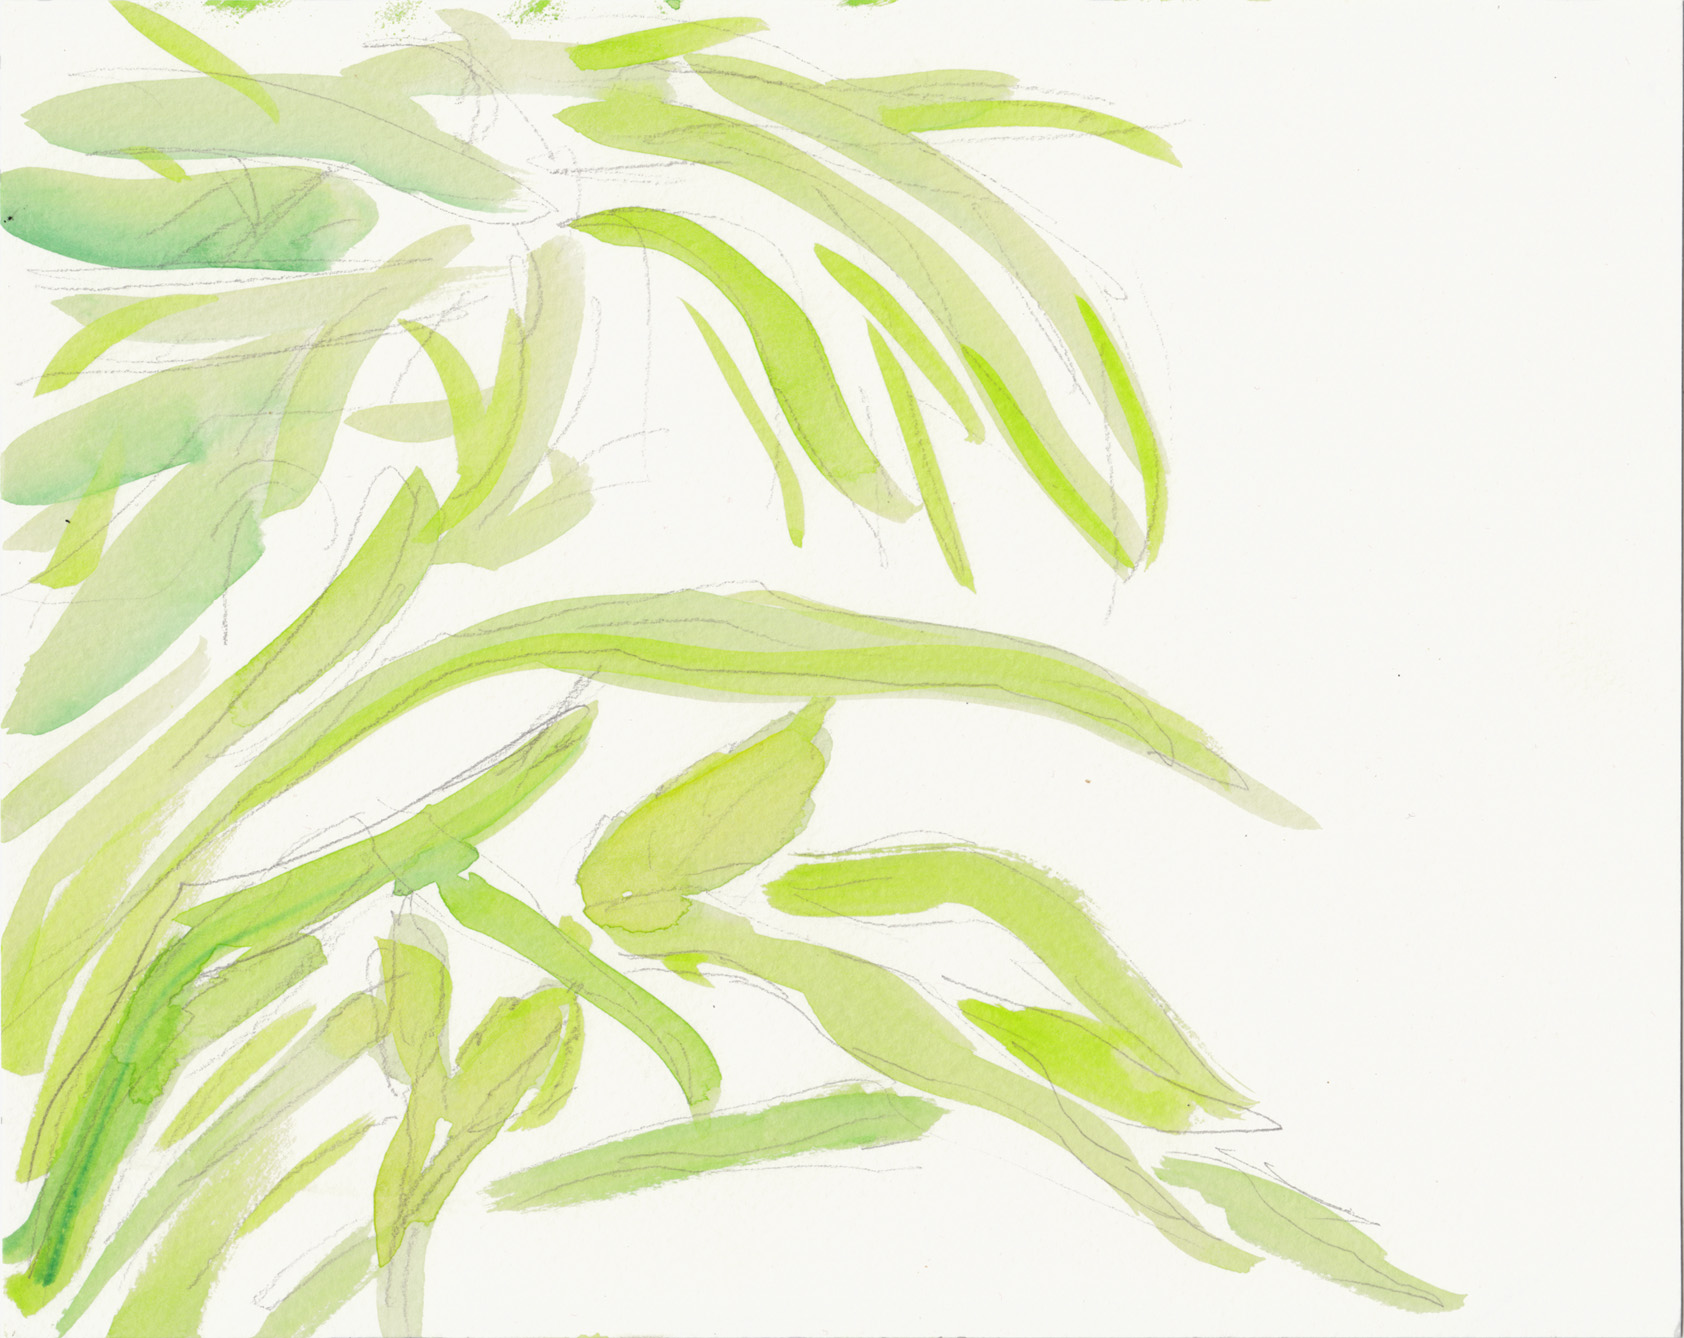 foliage 7 6-16